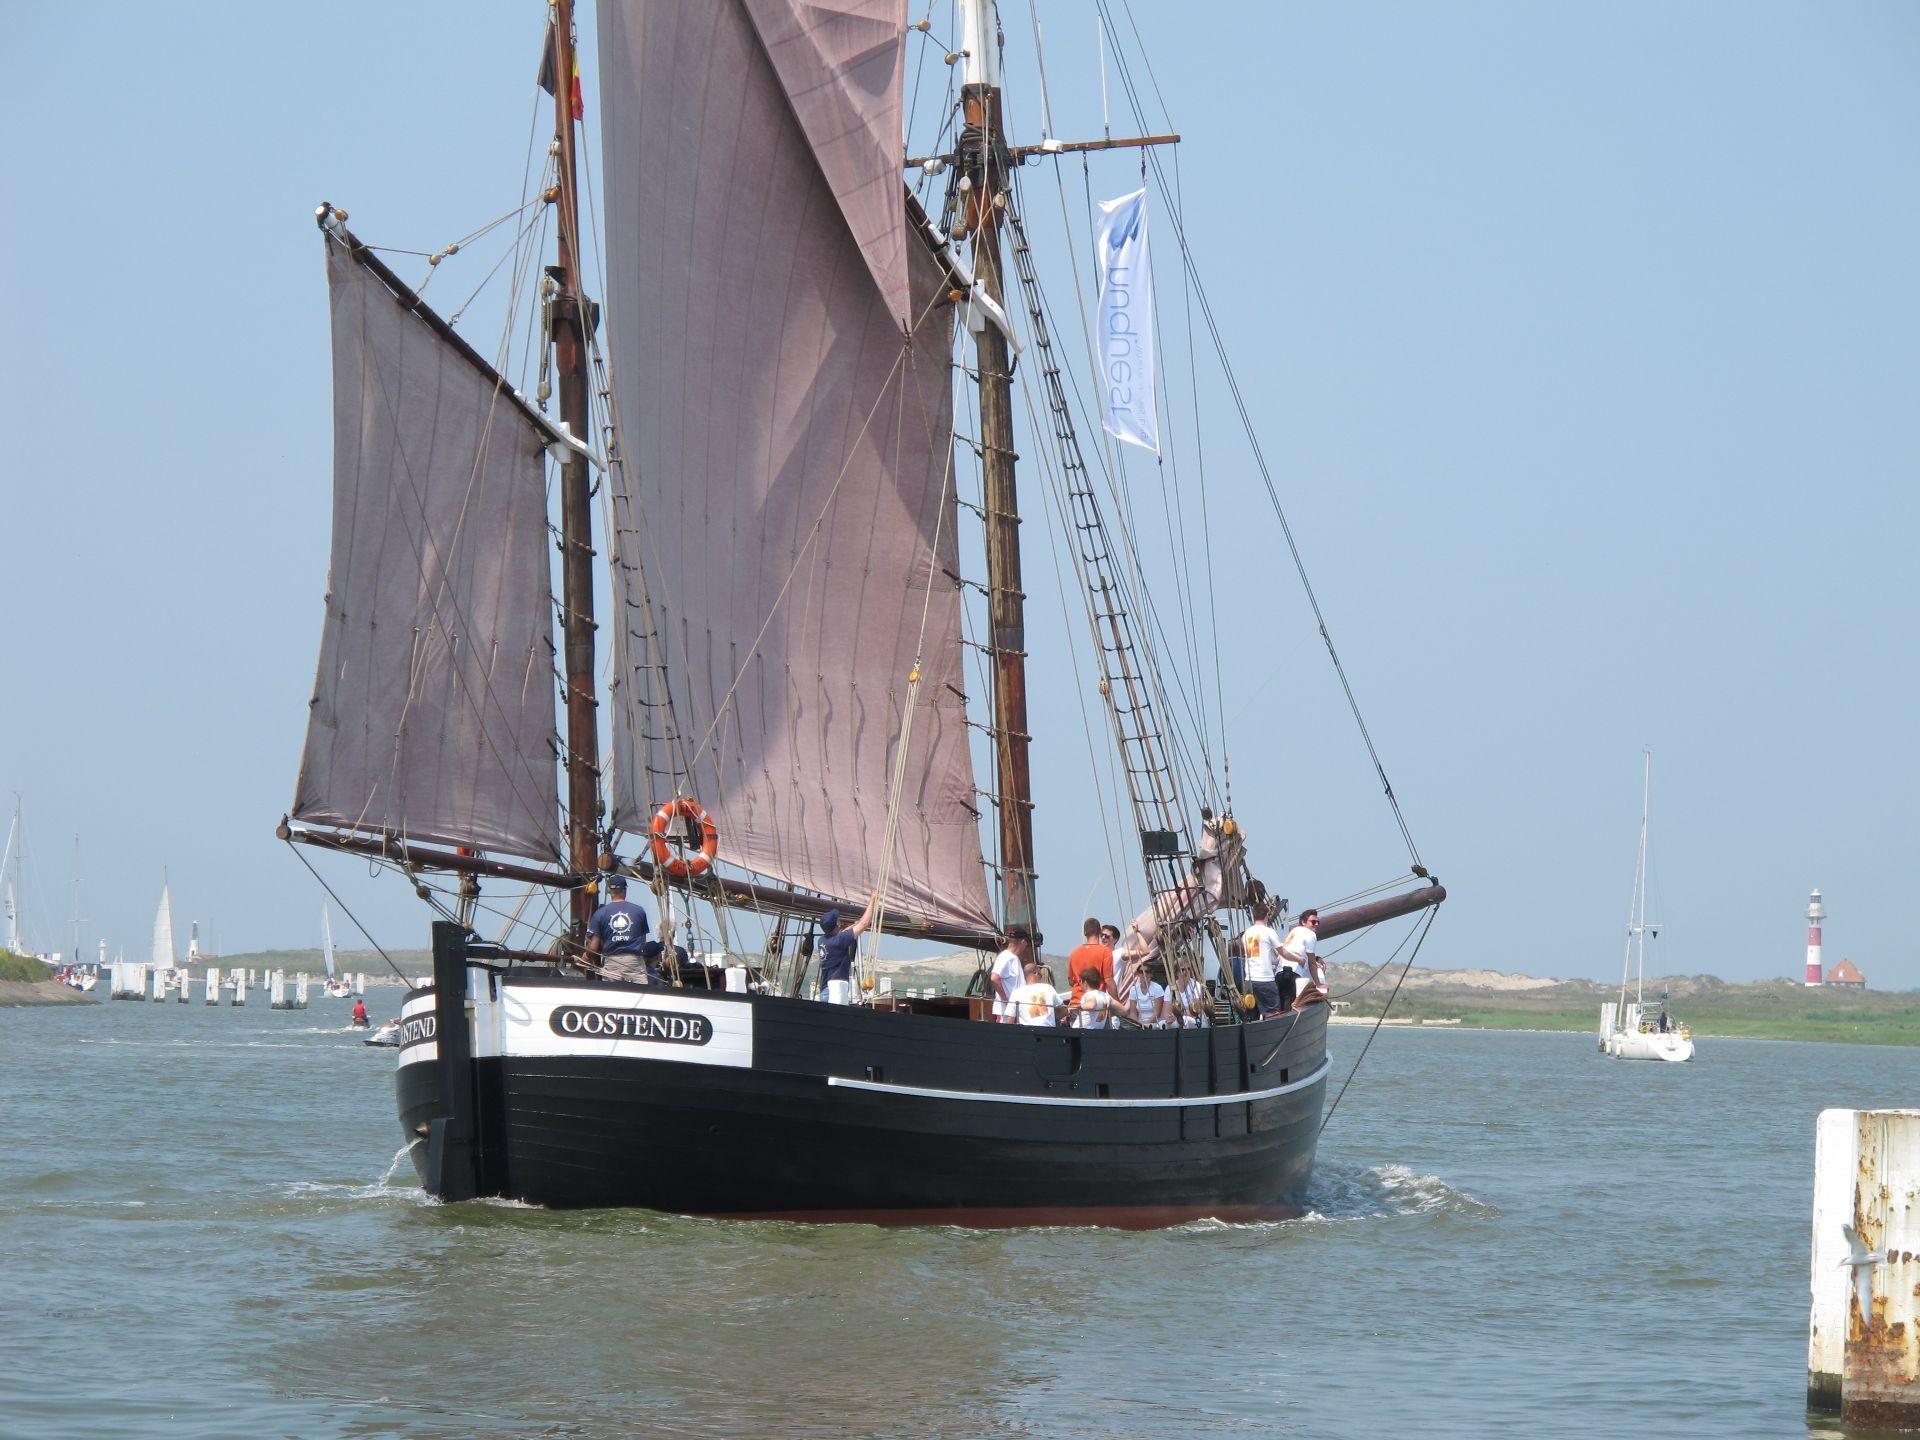 klipper sailing 25 personen met Nuquest